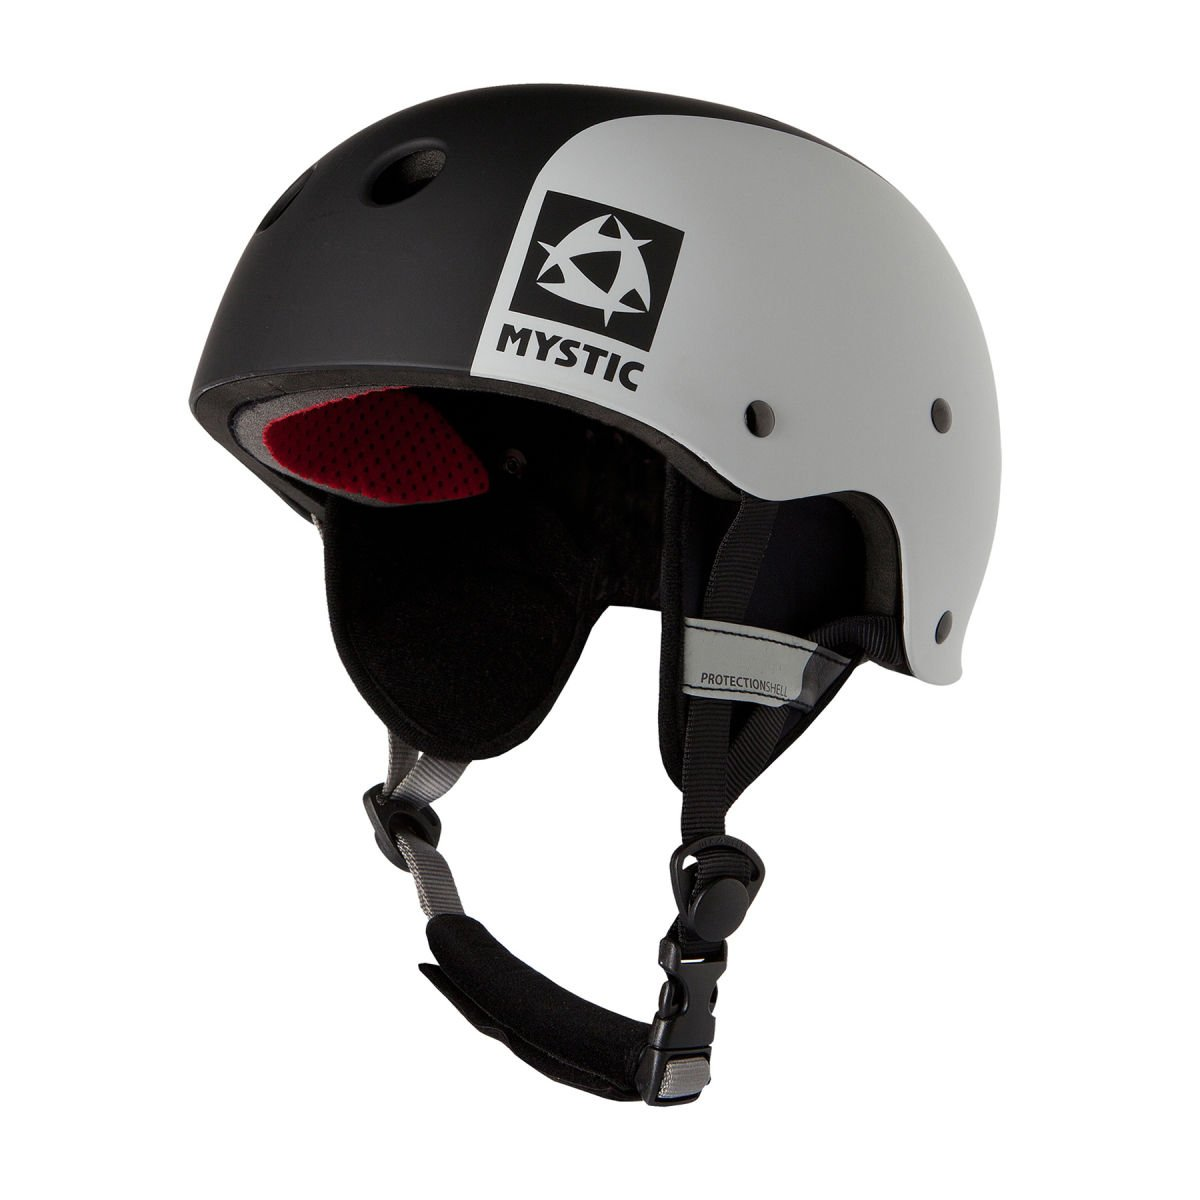 Mystic MK8 Multisport Helmet - Black